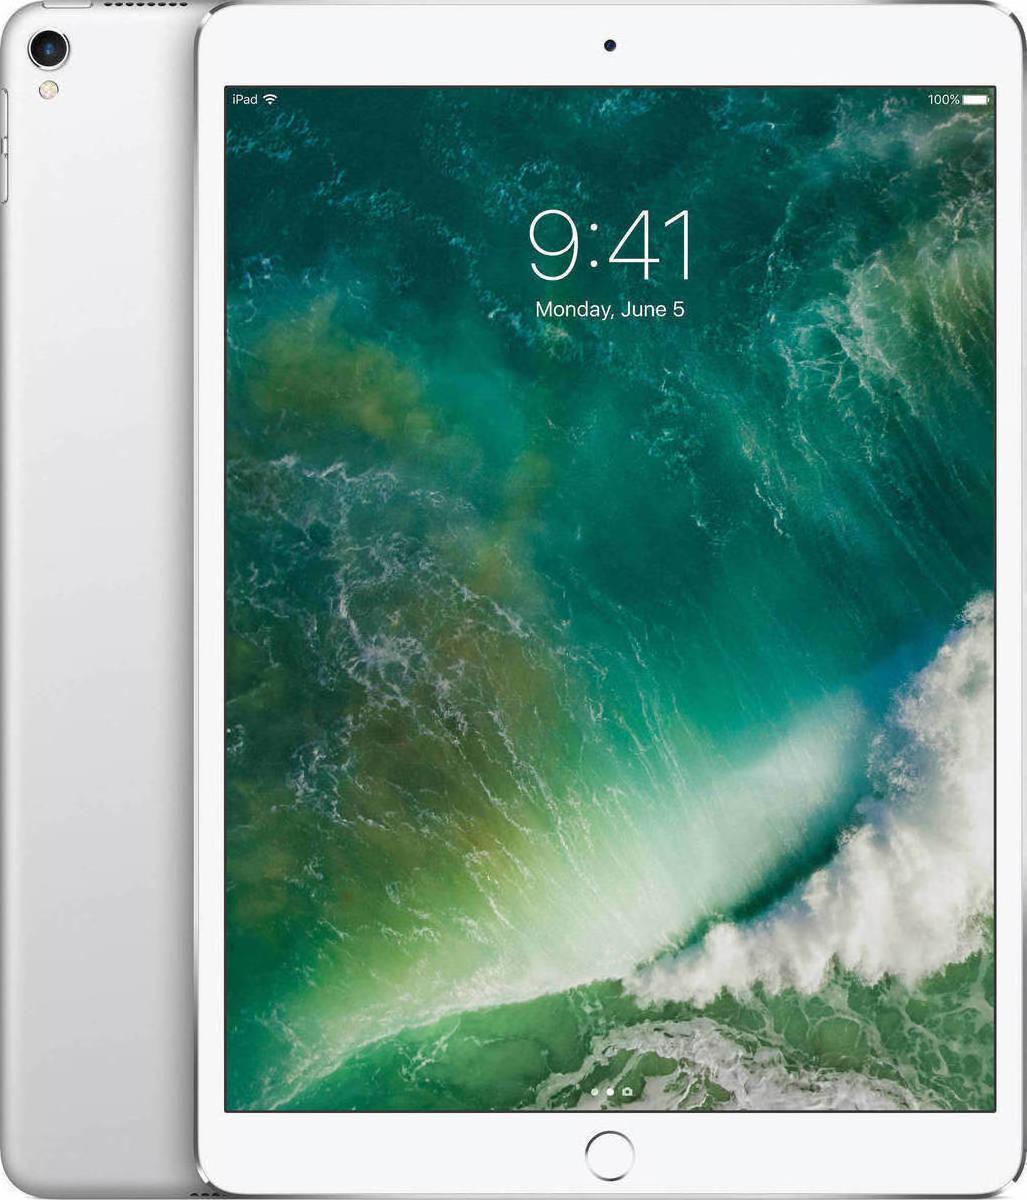 Apple iPad Pro 12.9'' 2017 WiFi and Cellular 512GB Silver Με Αντάπτορα Πληρωμή έως 24 δόσεις